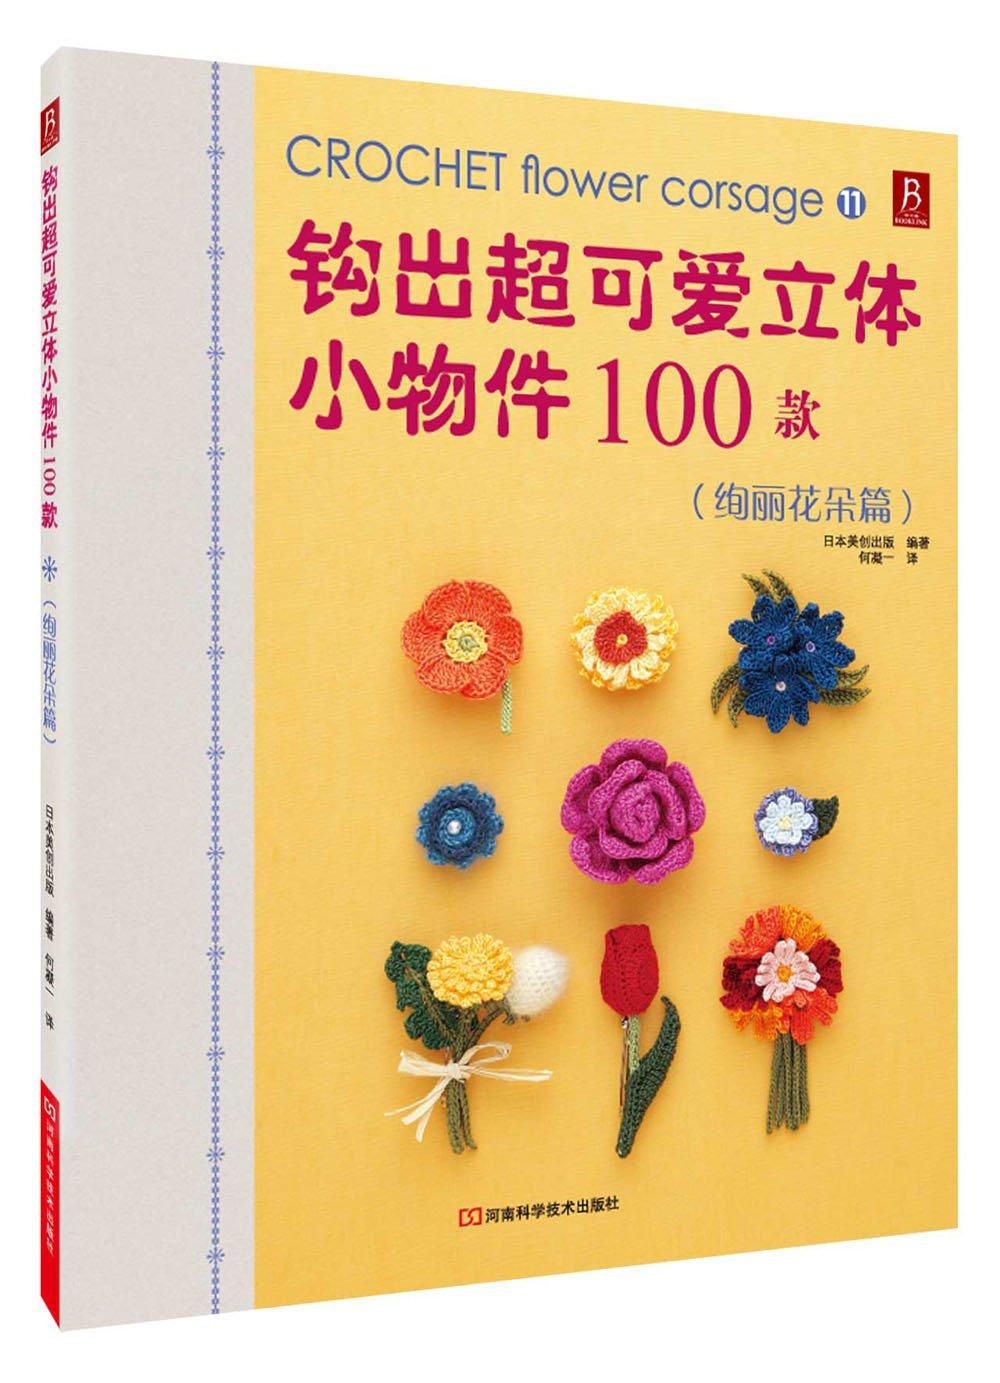 Crochet Flower Corsage  / Weaving Super-cute 3d Small Objects 100 Models Chinese Knitting Book / 3D Handmade Carft Book